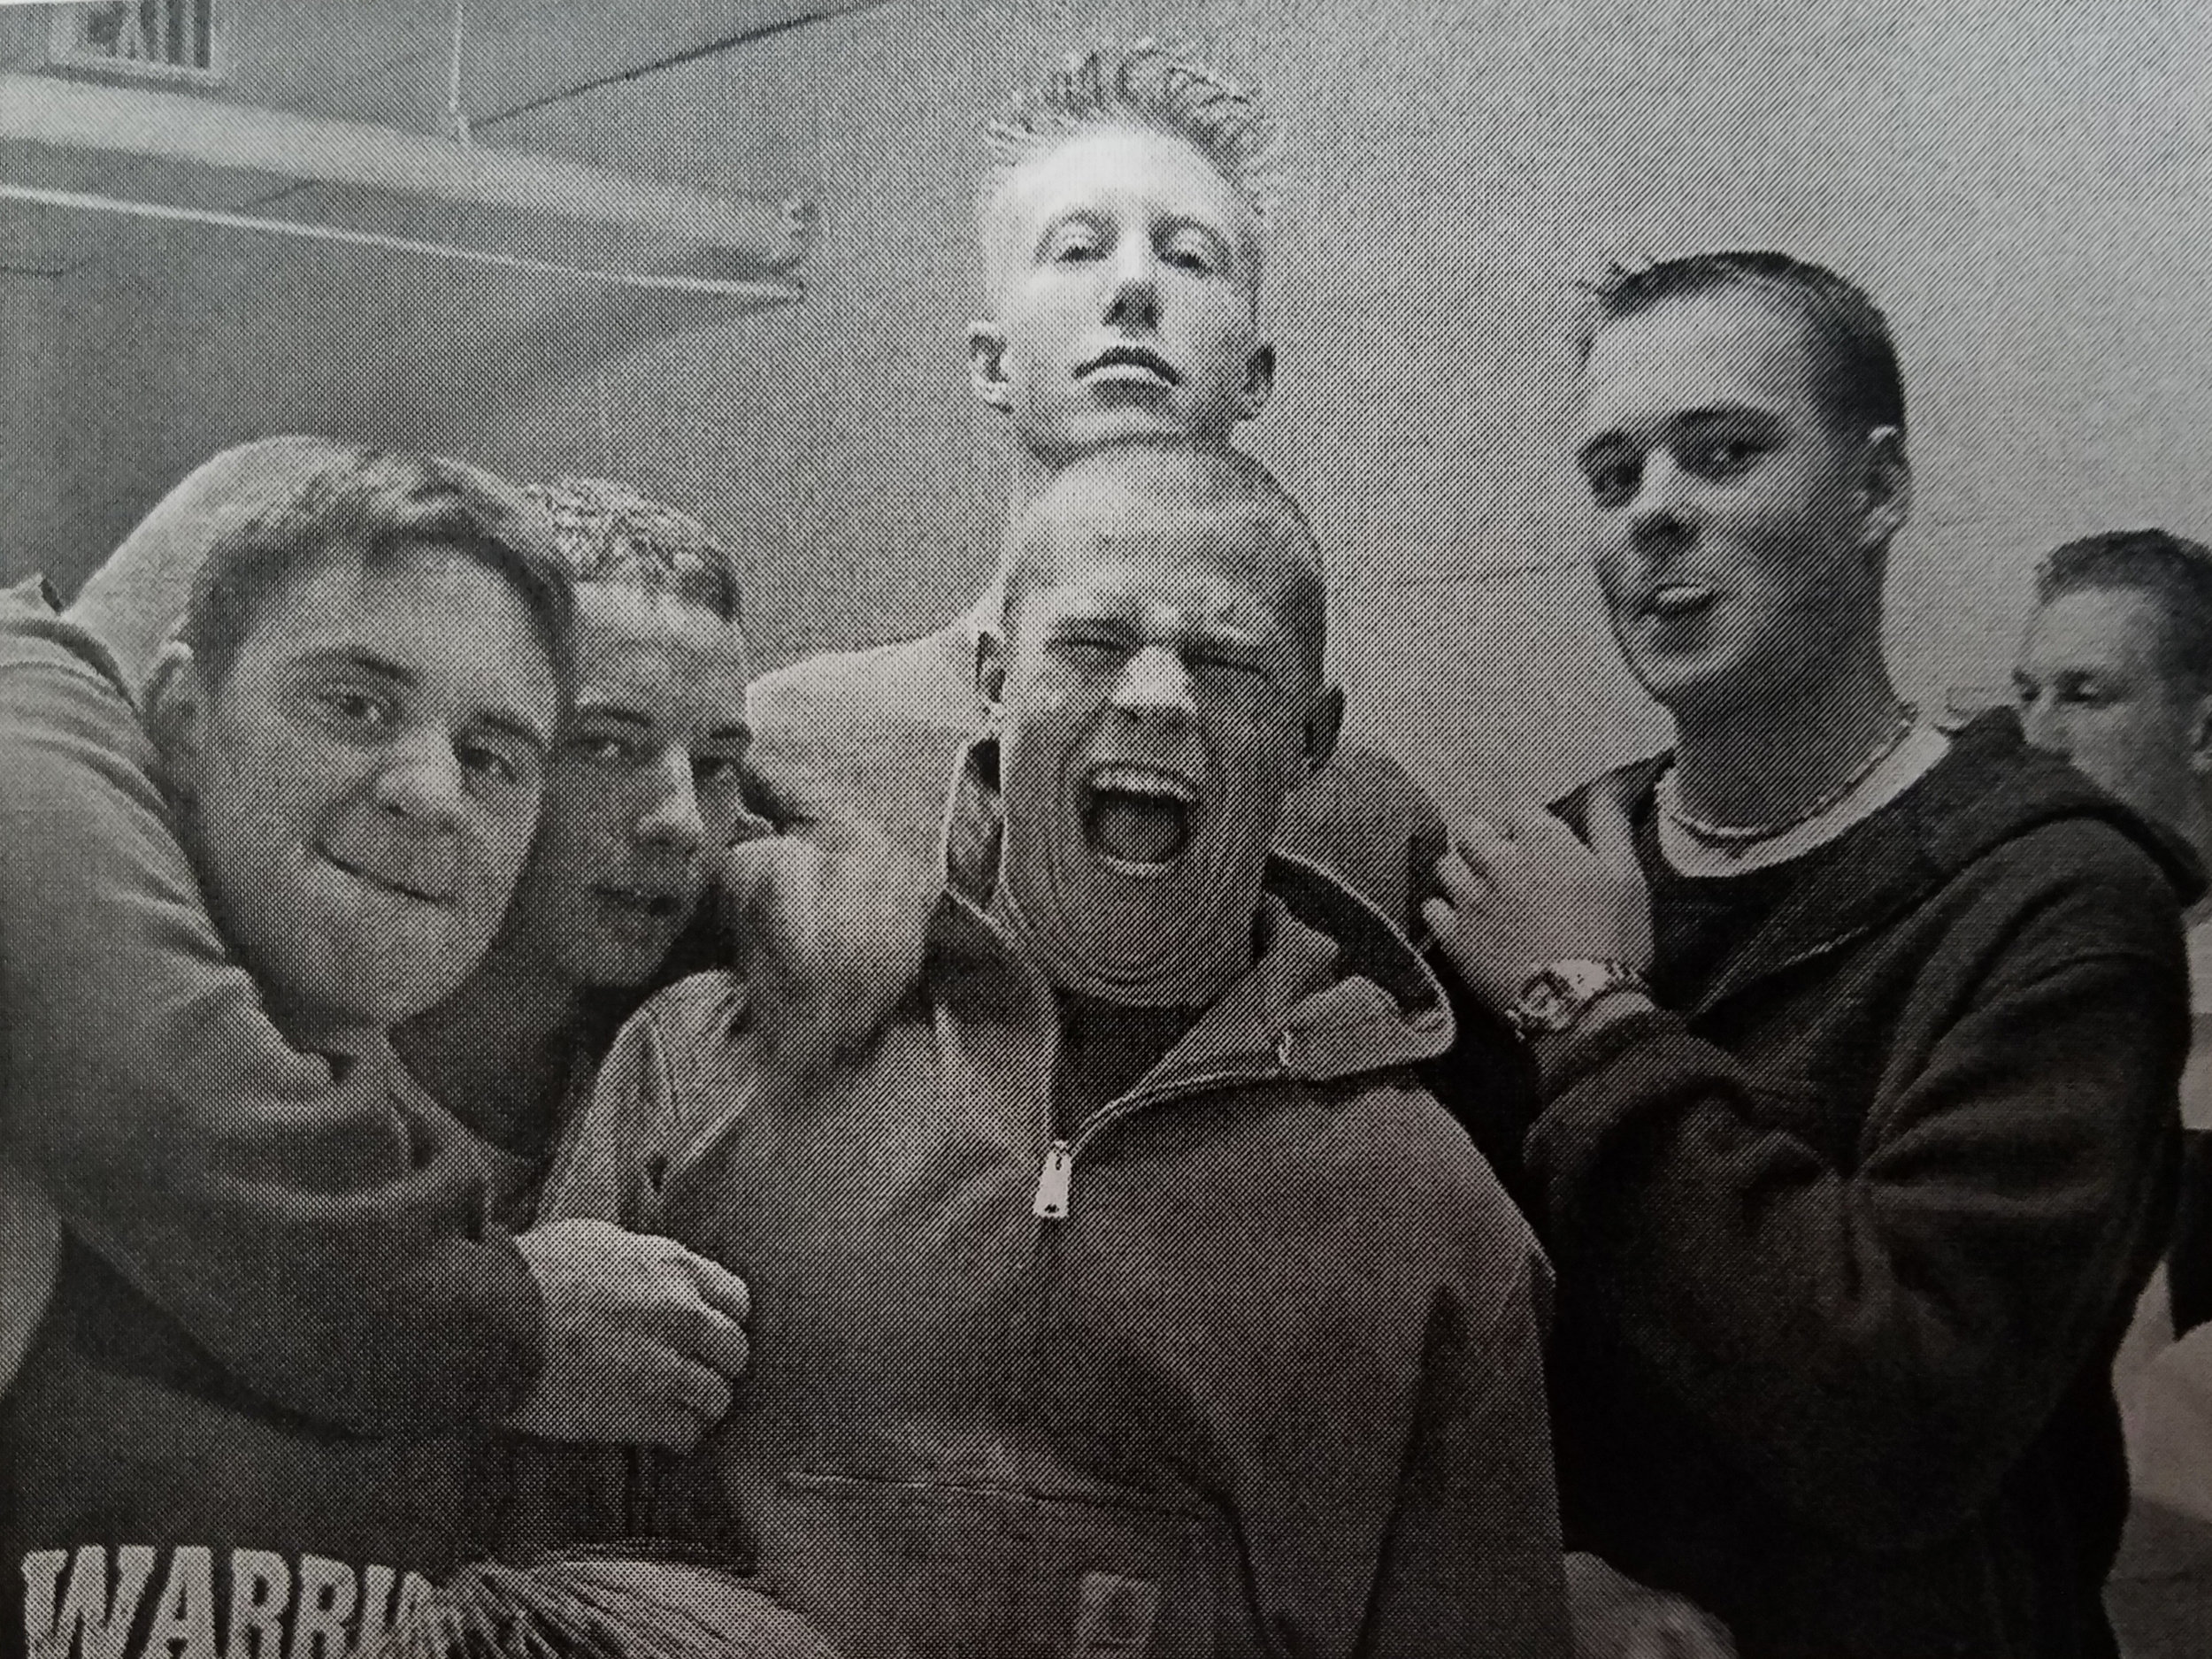 The Warriors basketball varsity team celebrates a win, ca. 2000